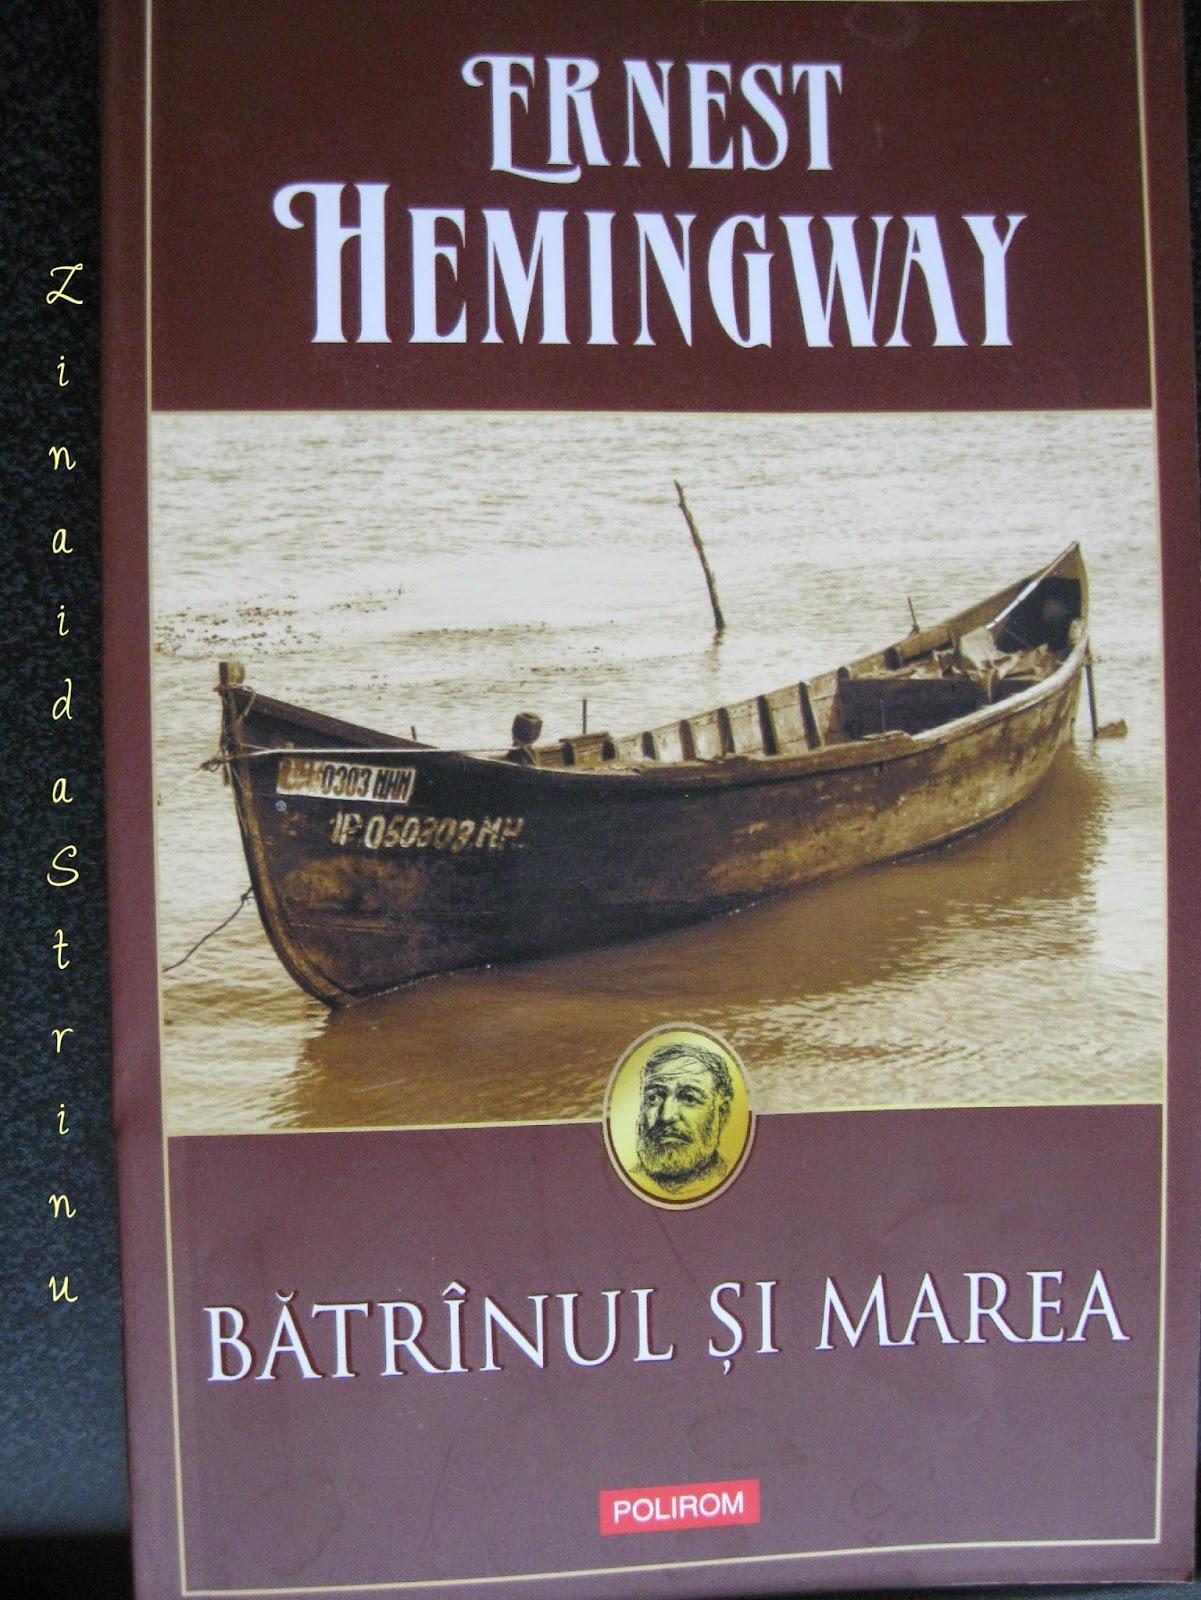 batranul-si-marea-ernest-hemingway